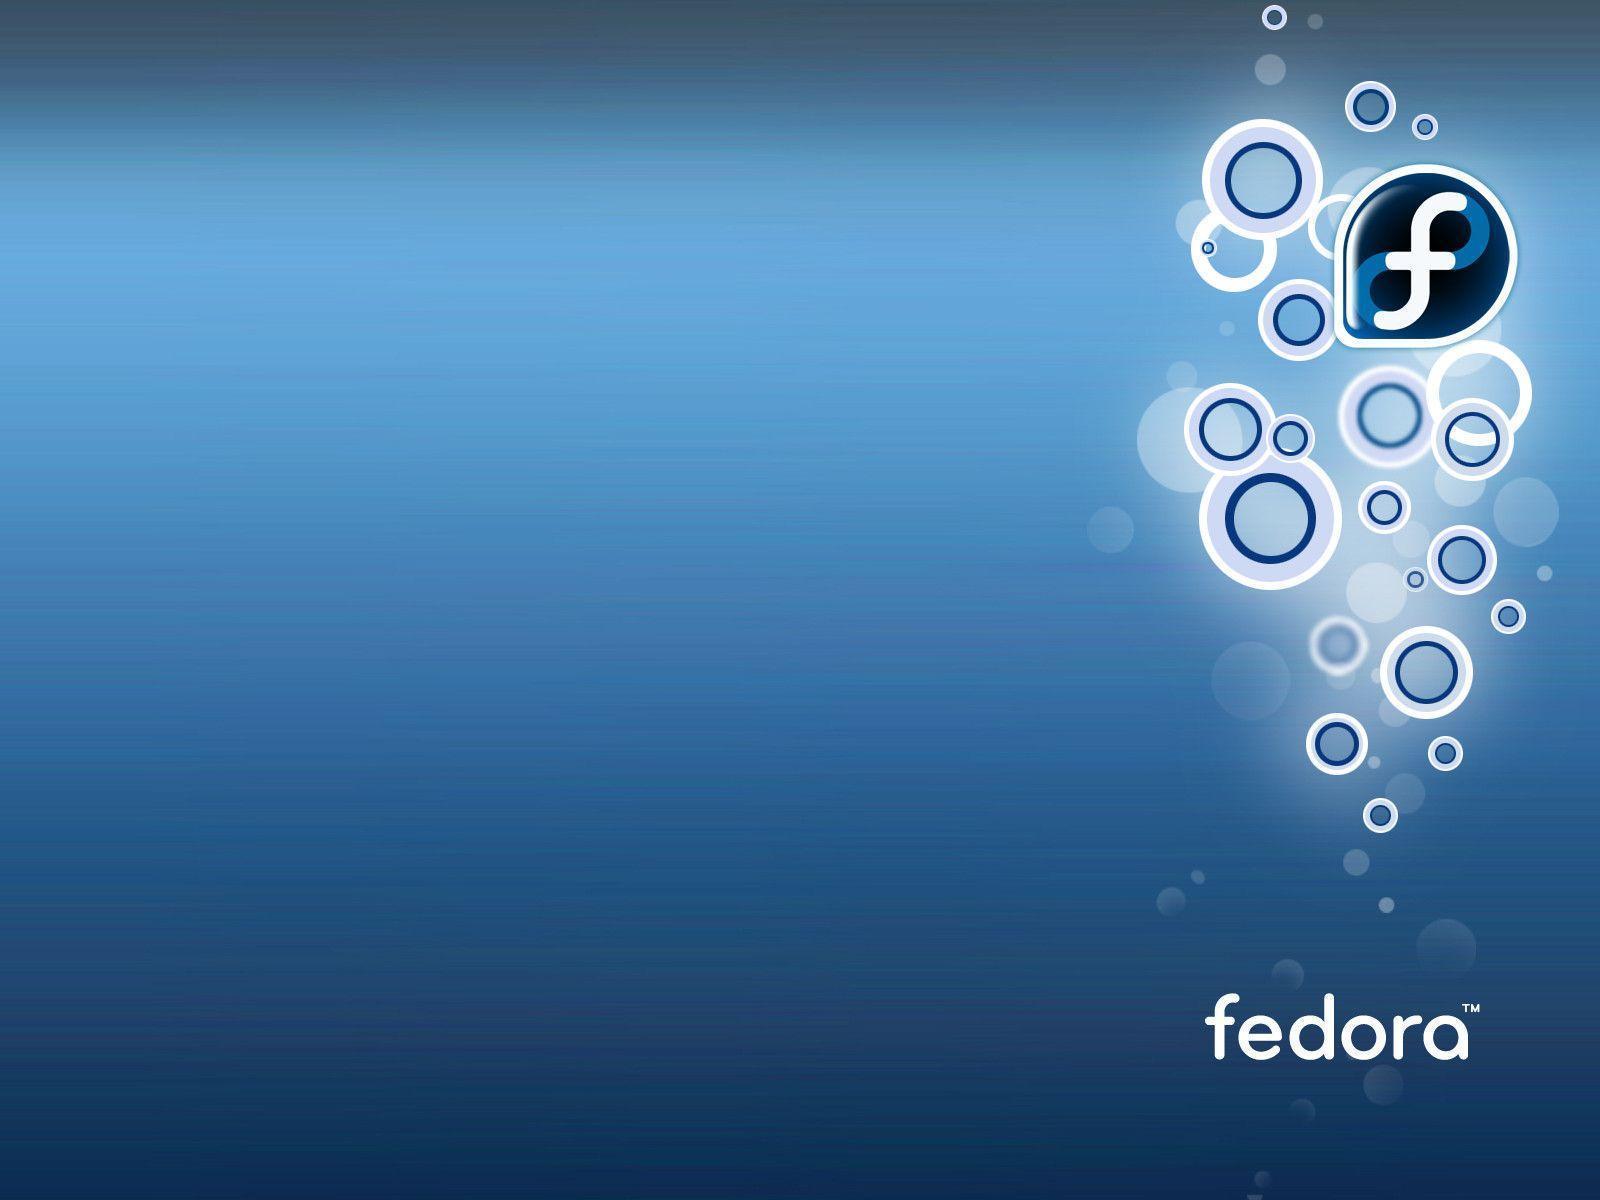 linux fedora wallpaper - photo #2